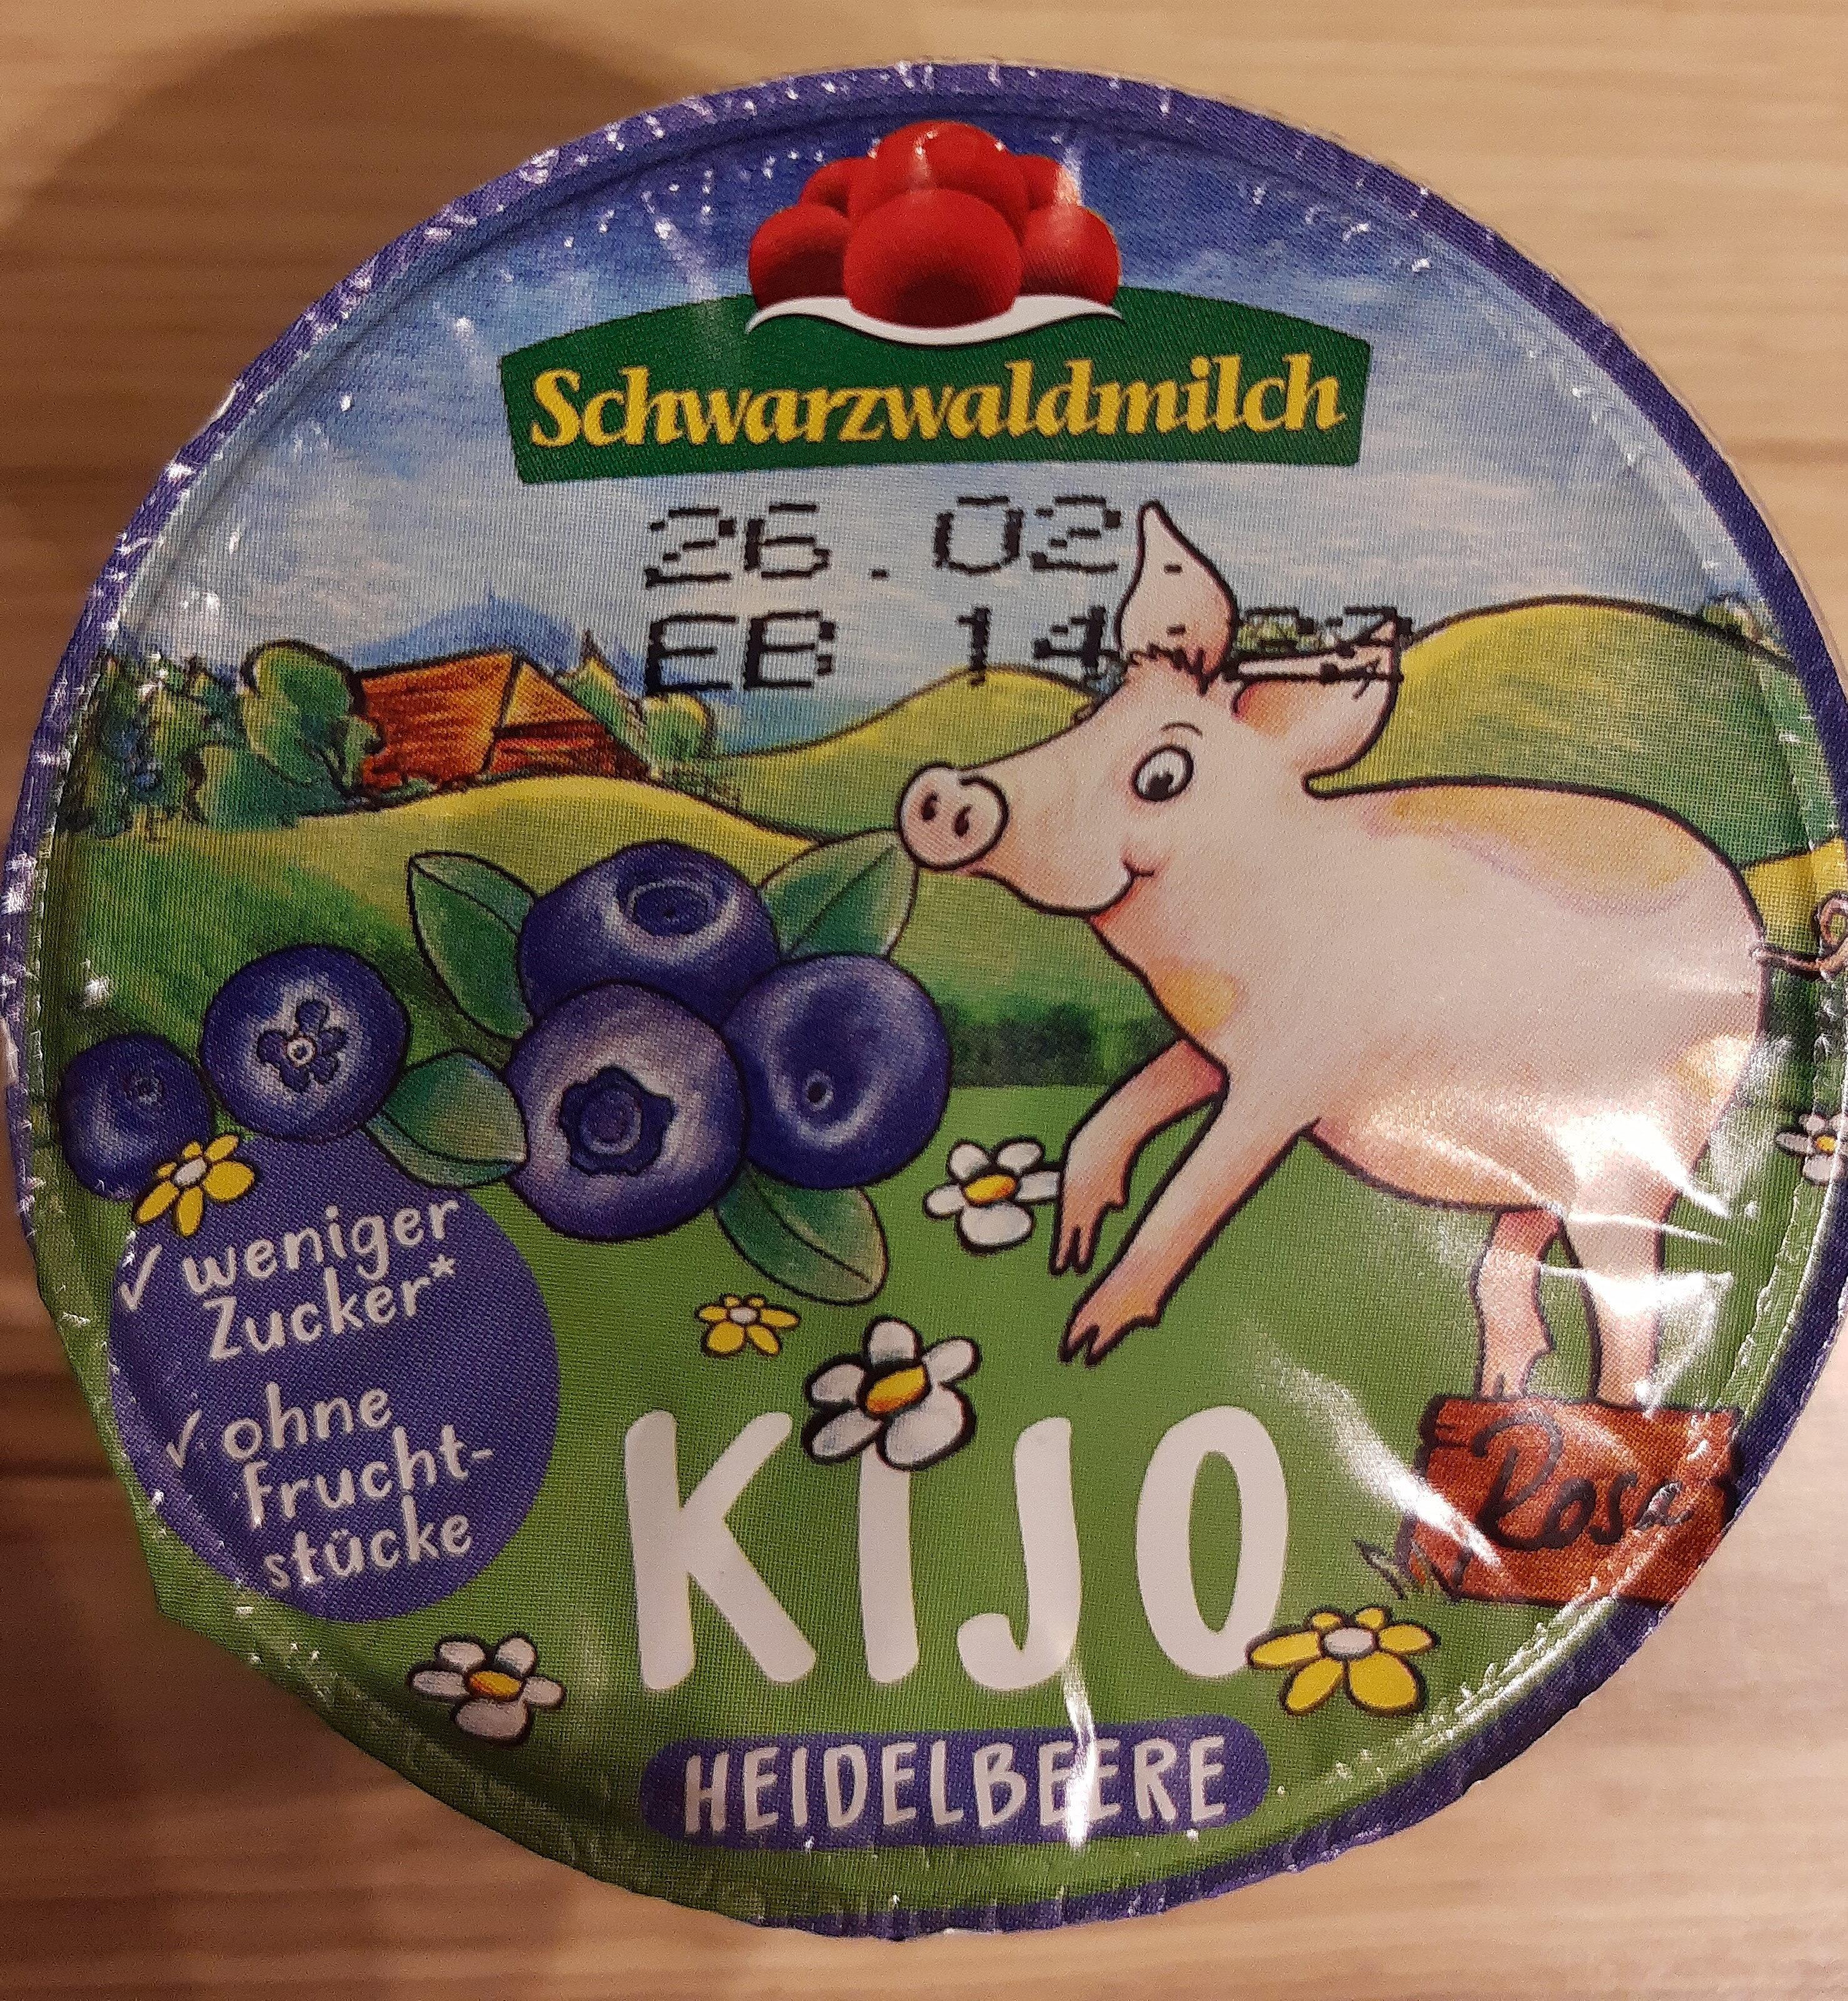 Schwarzwaldmilch  Kijo Heidelbeere - Produkt - de